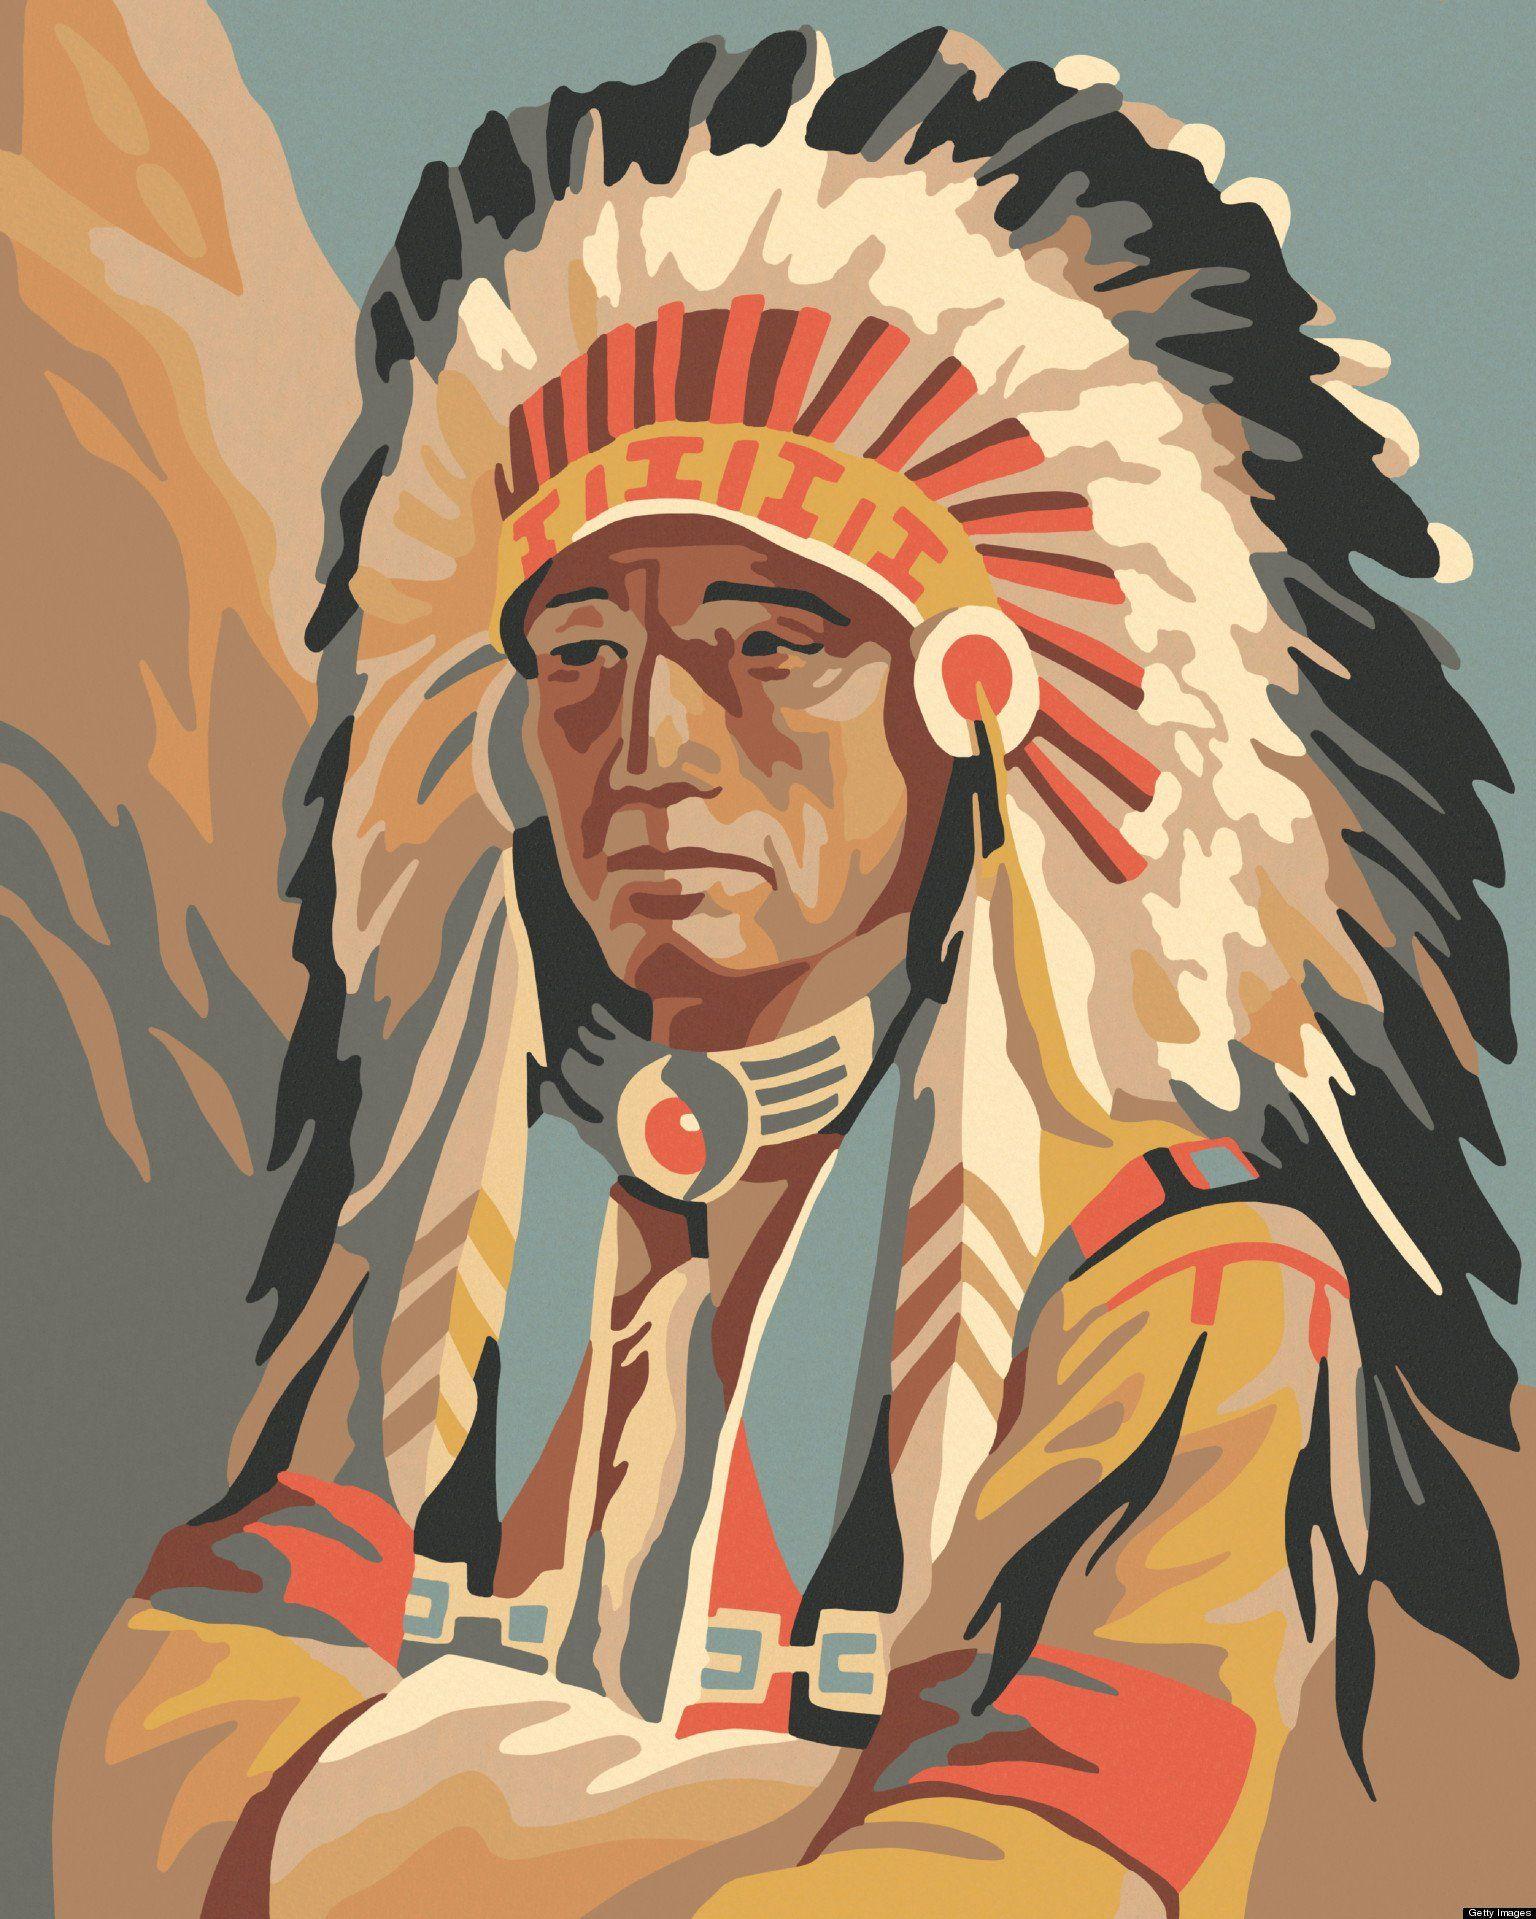 Is It Still Columbus Day A R T I C L E S in 2019 Indian 1536x1919